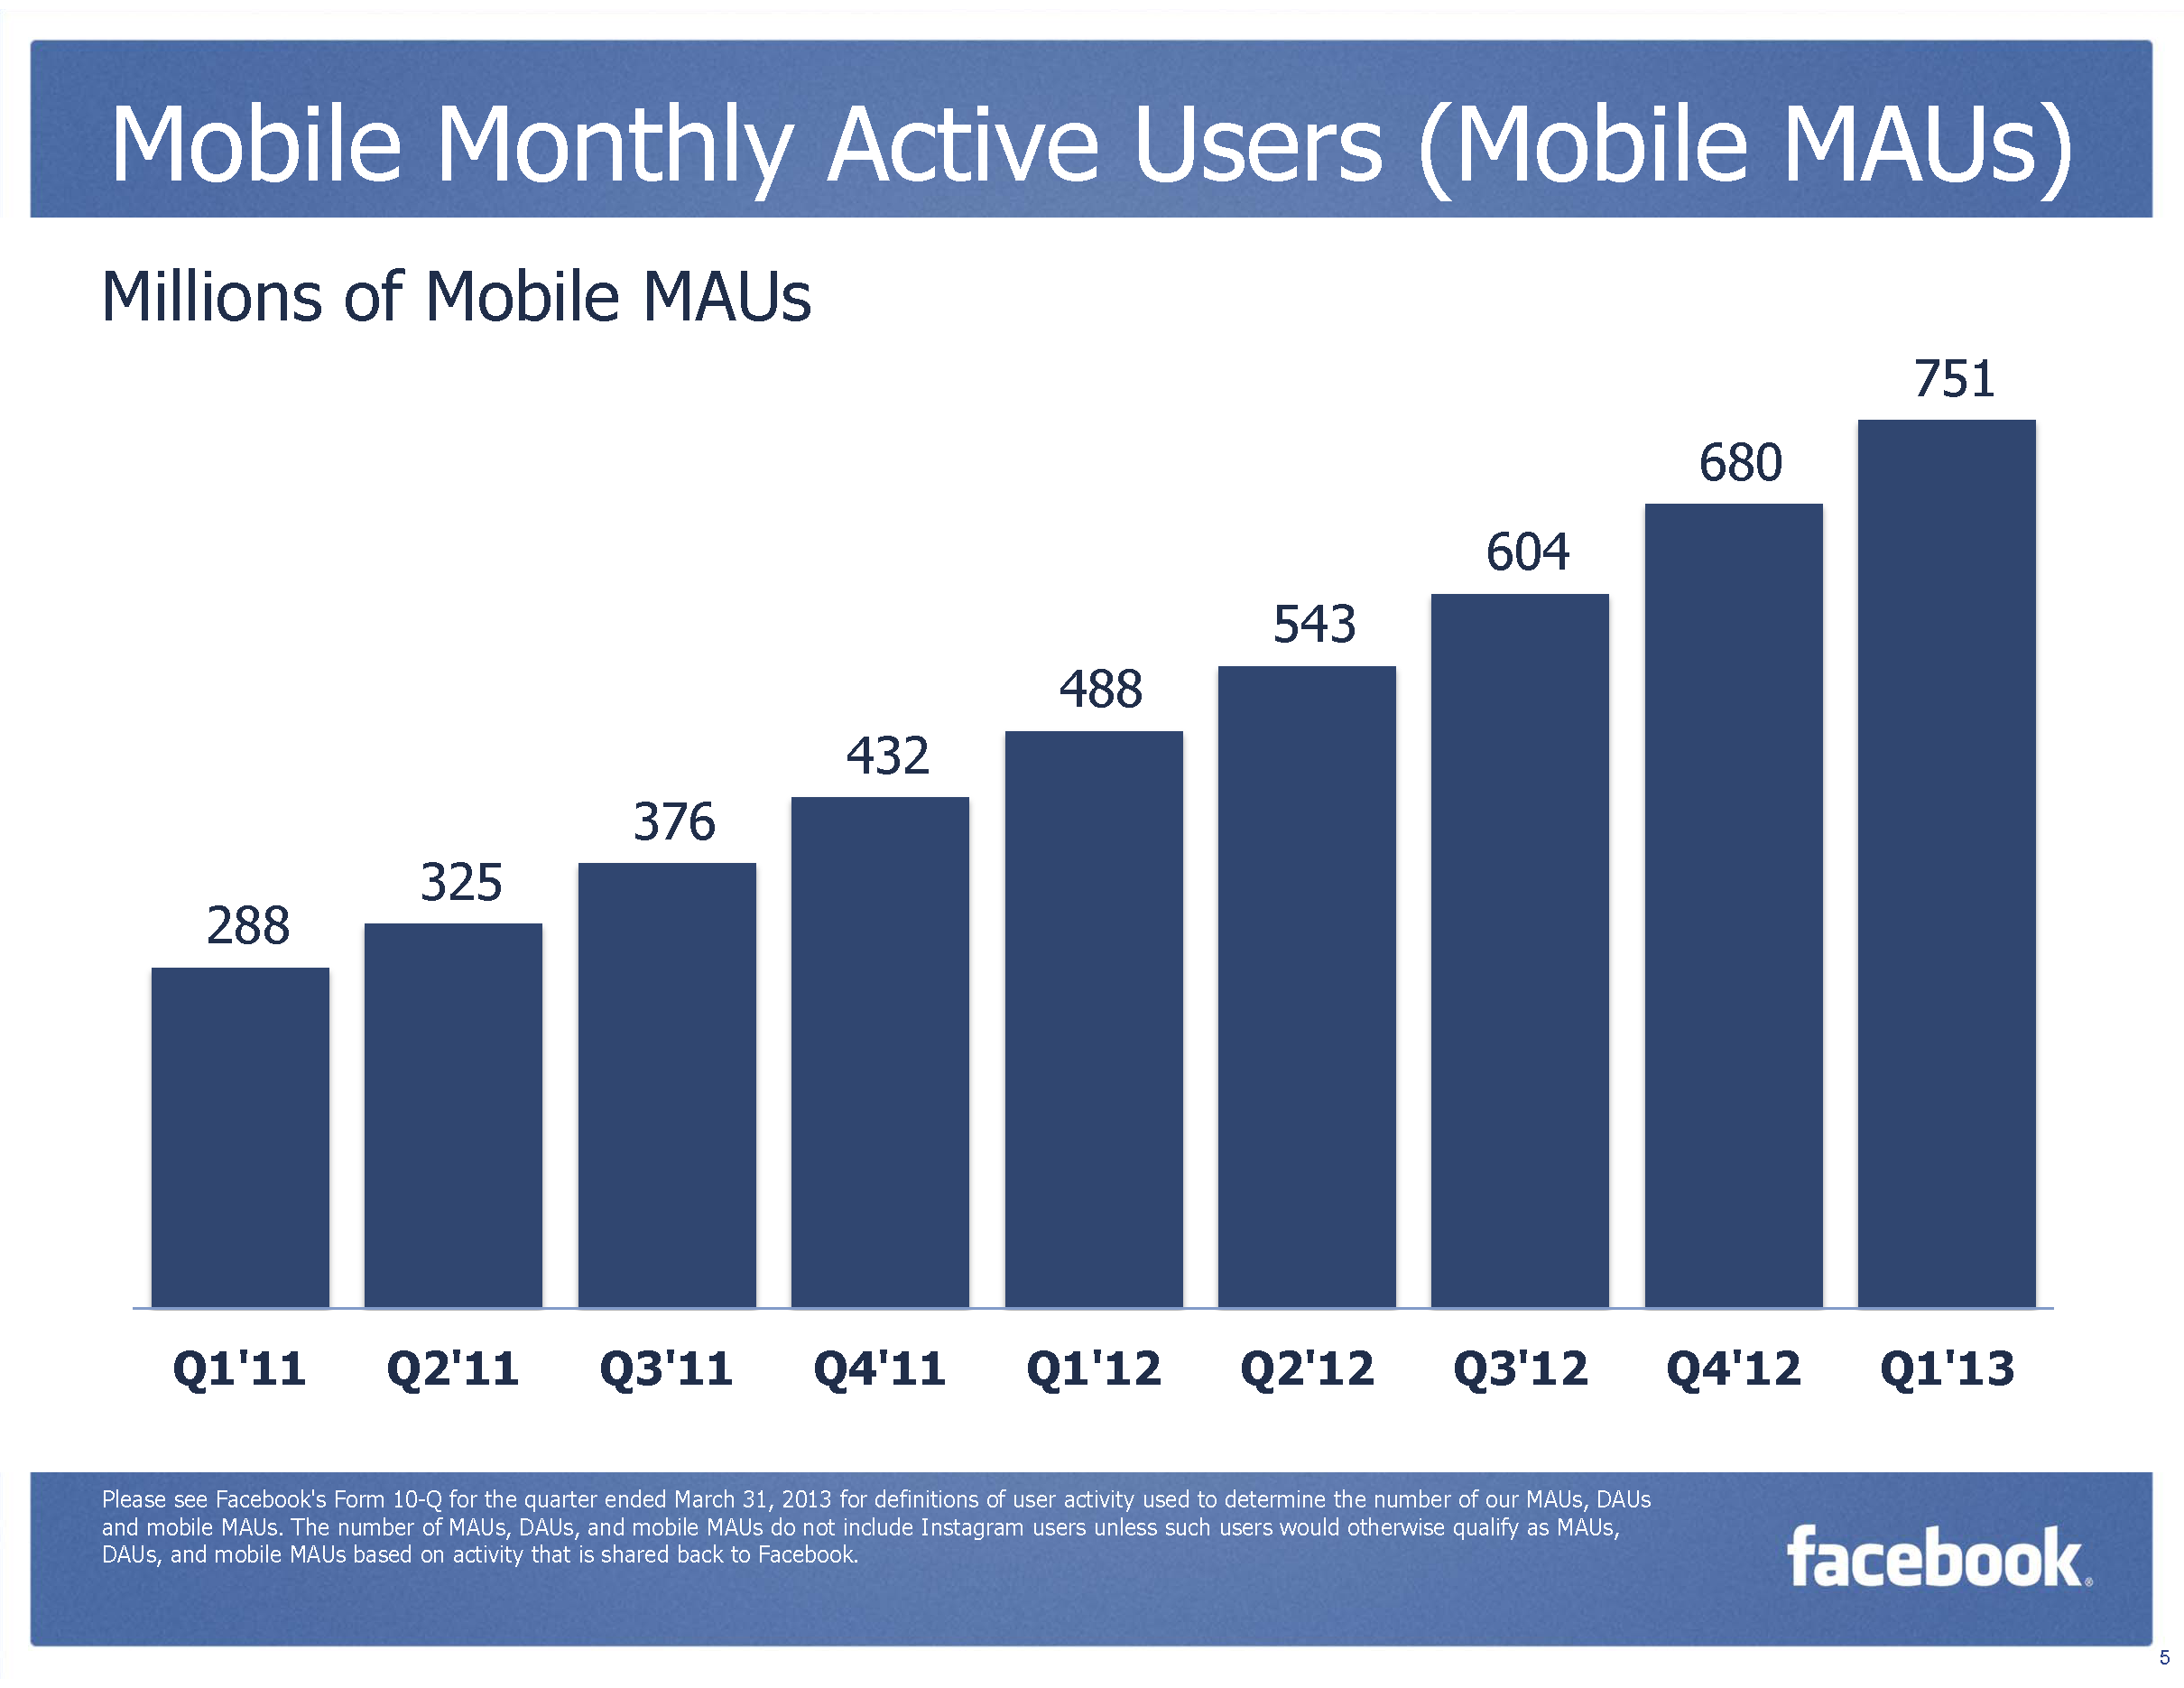 Facebook MAU Monthly Active Mobile User Q4/2012 (Quelle: Facebook.com)